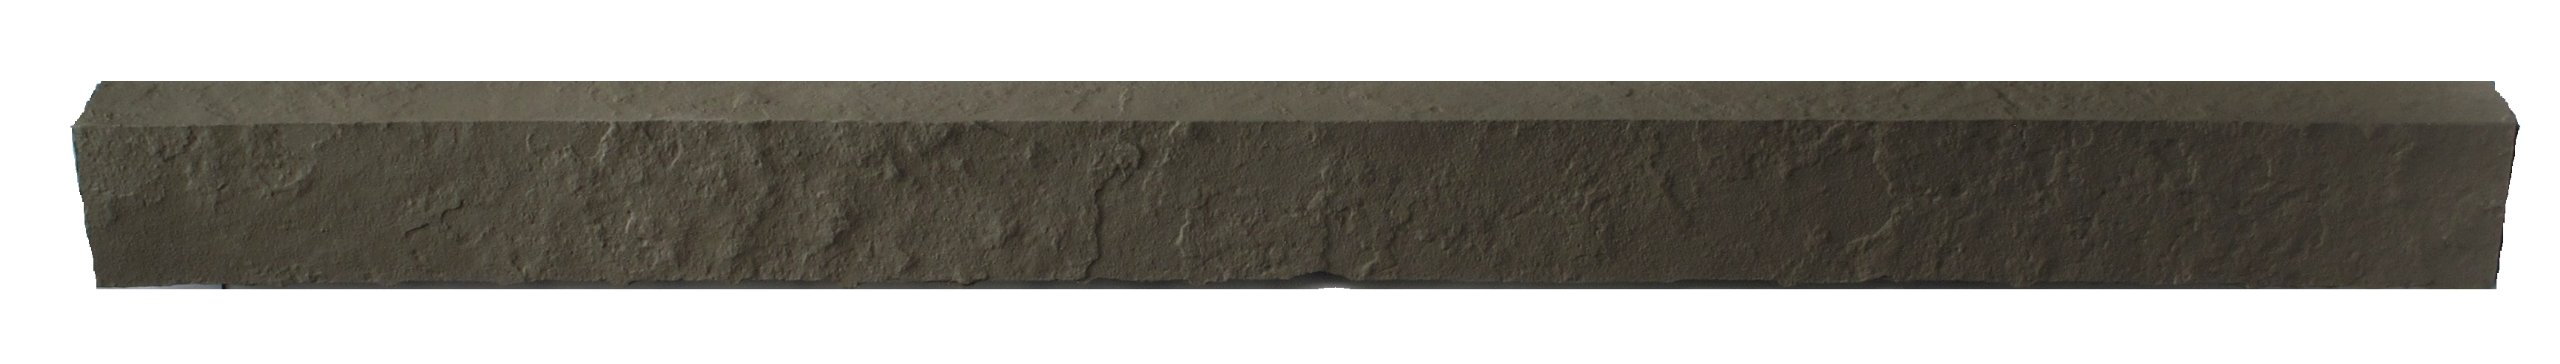 NextStone 6NWTG1 Window/Door Trim 4-Pack, Gray